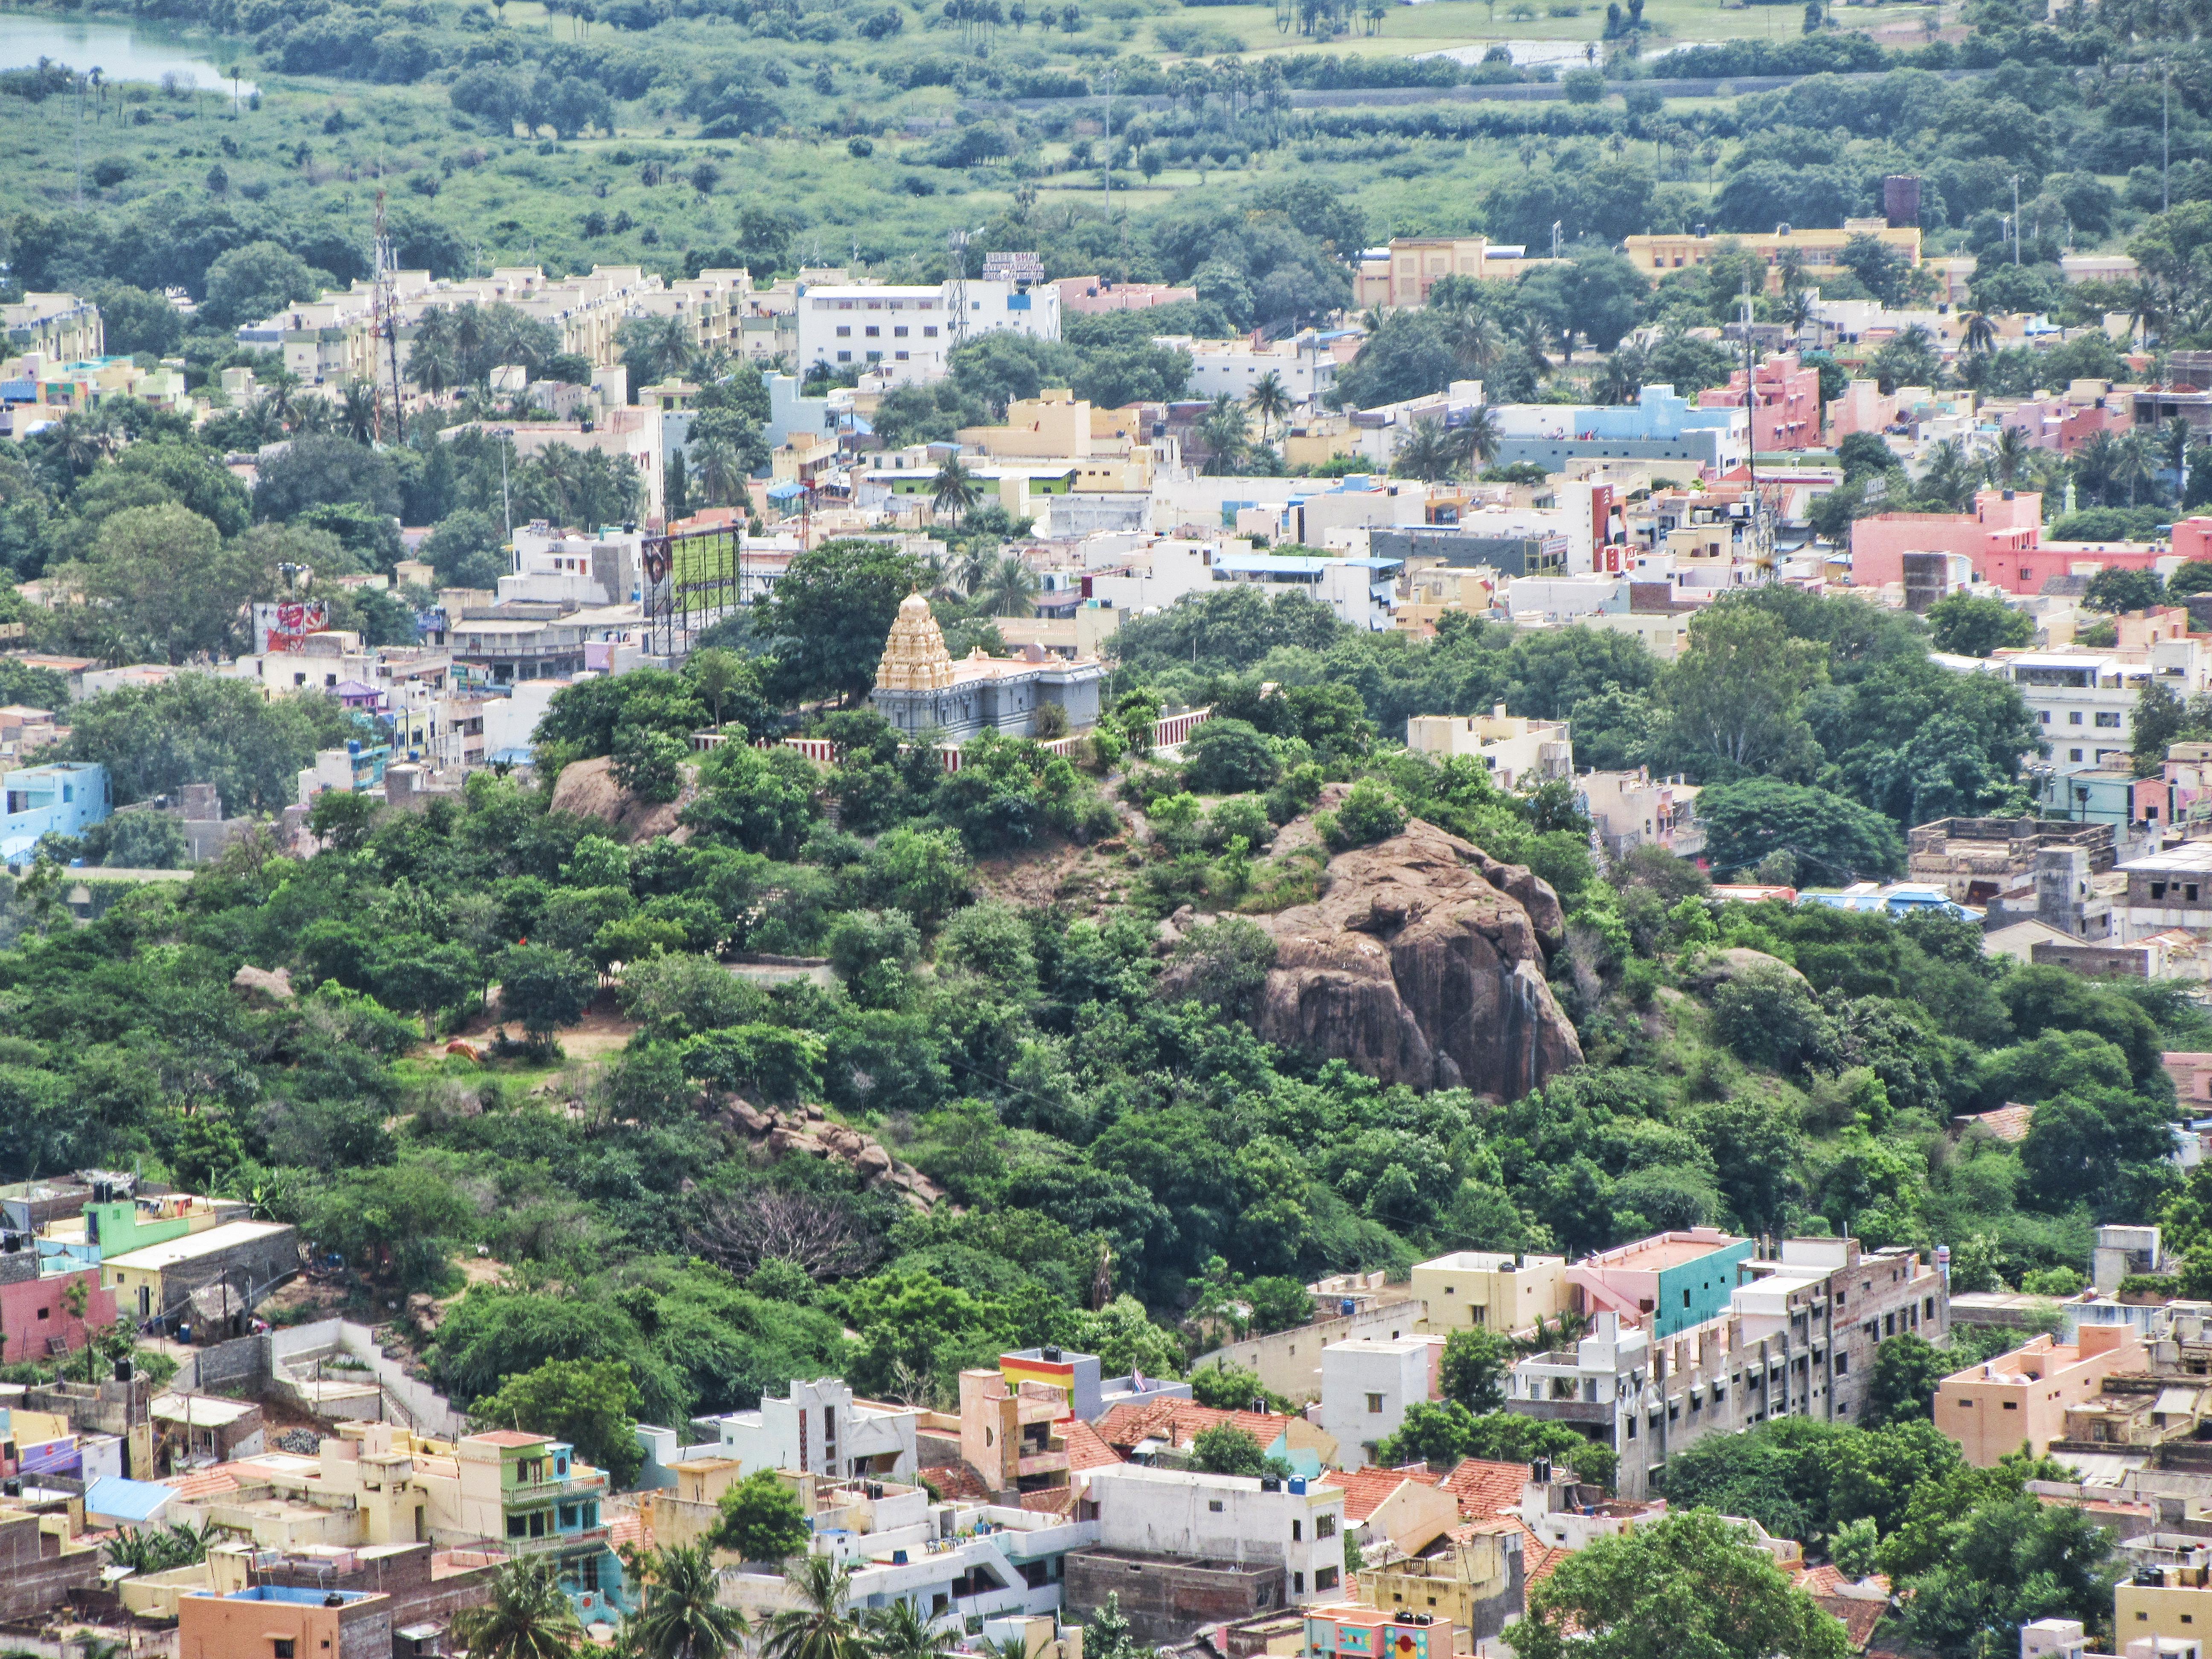 View of Arthanarisvarar Temple from the viewing rock below Skandashram